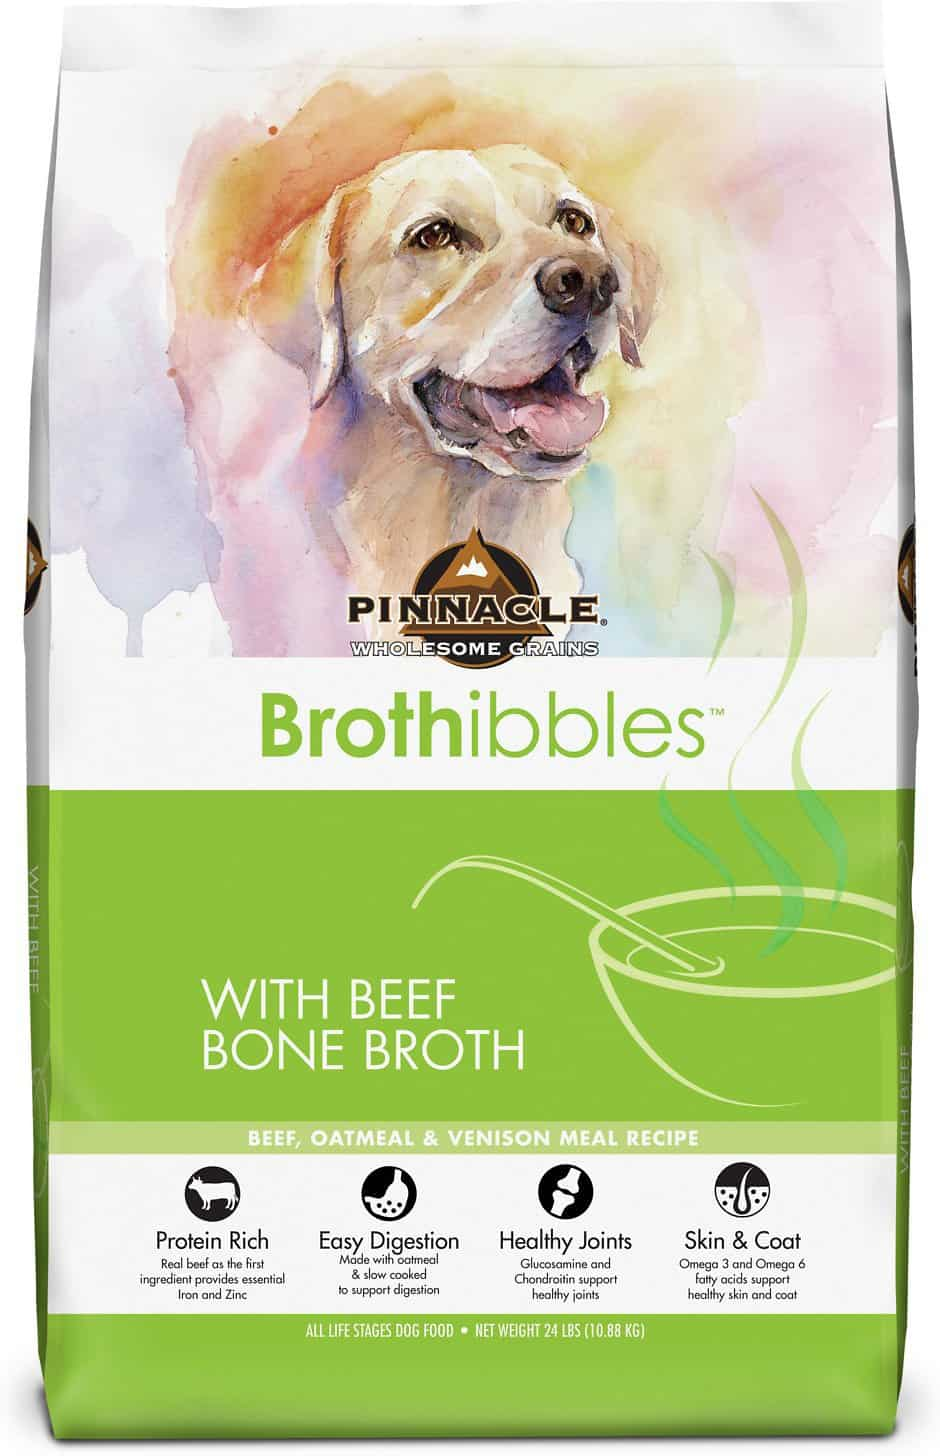 Pinnacle Dog Food: 2021 Review, Recalls & Coupons 10